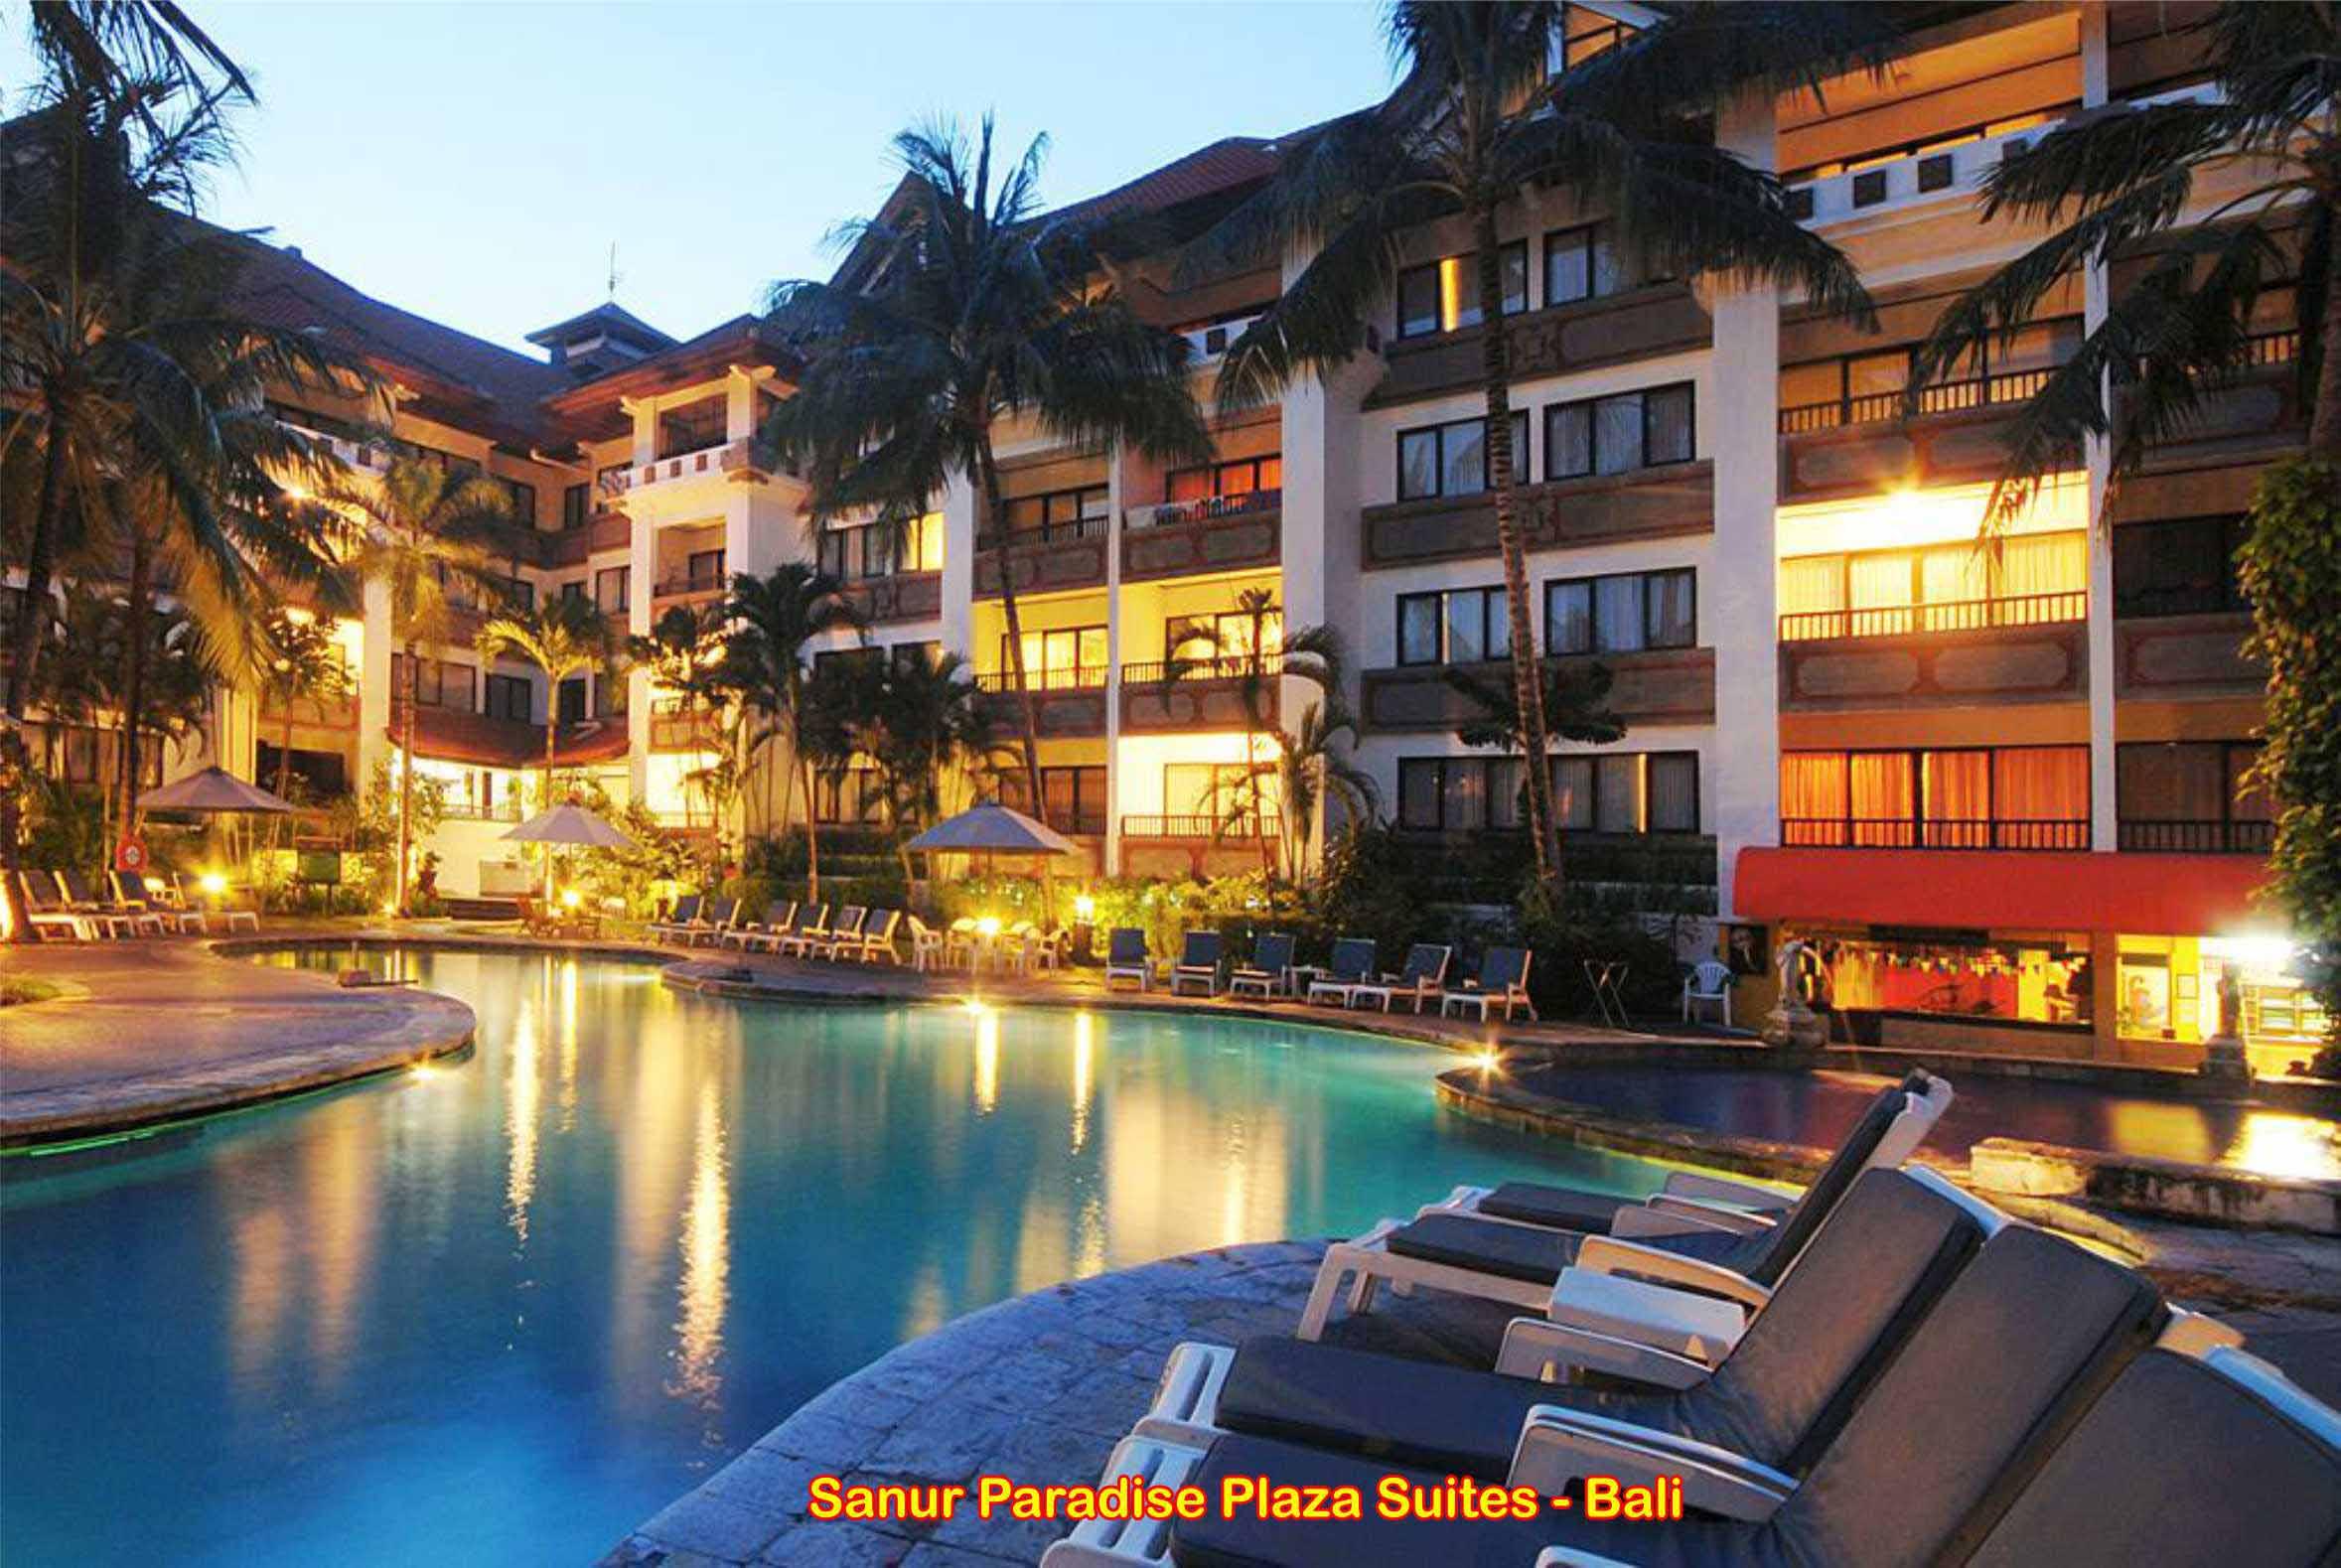 Sanur Paradise Suites Plaza, Bali - Indonesia 1